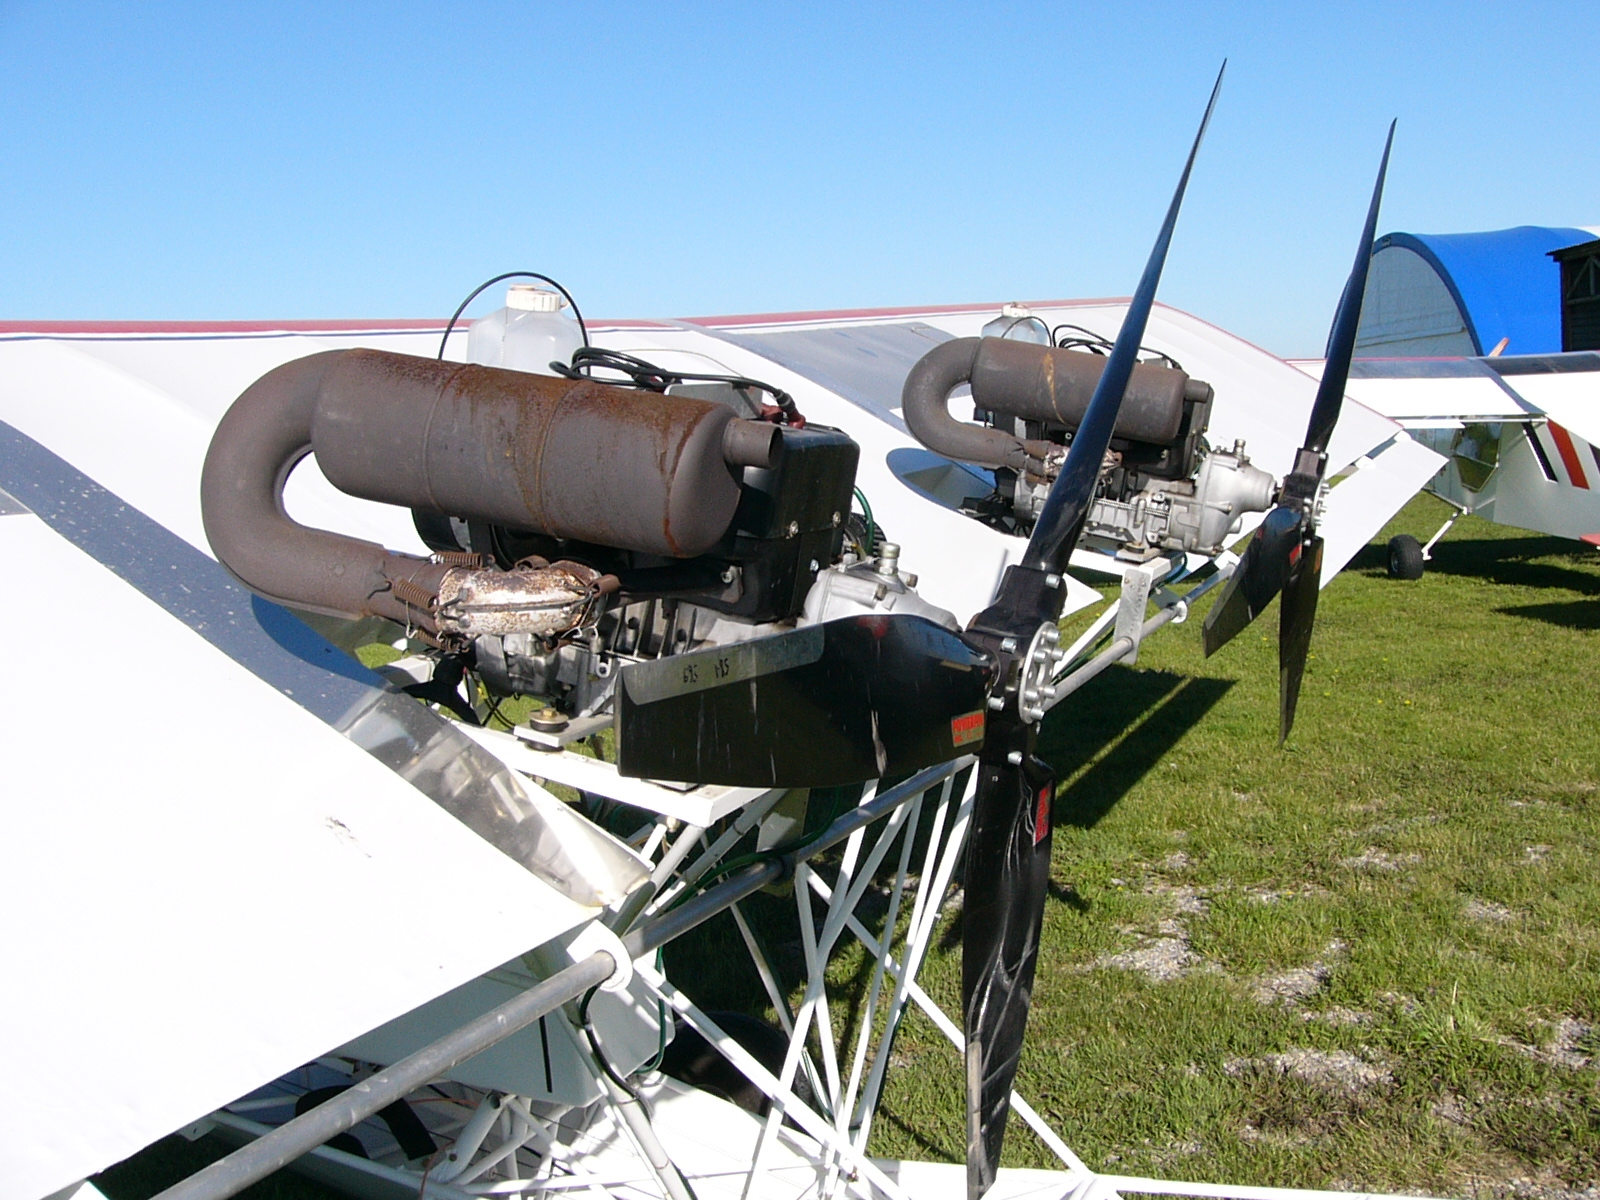 Twin Engine EZ Flyer